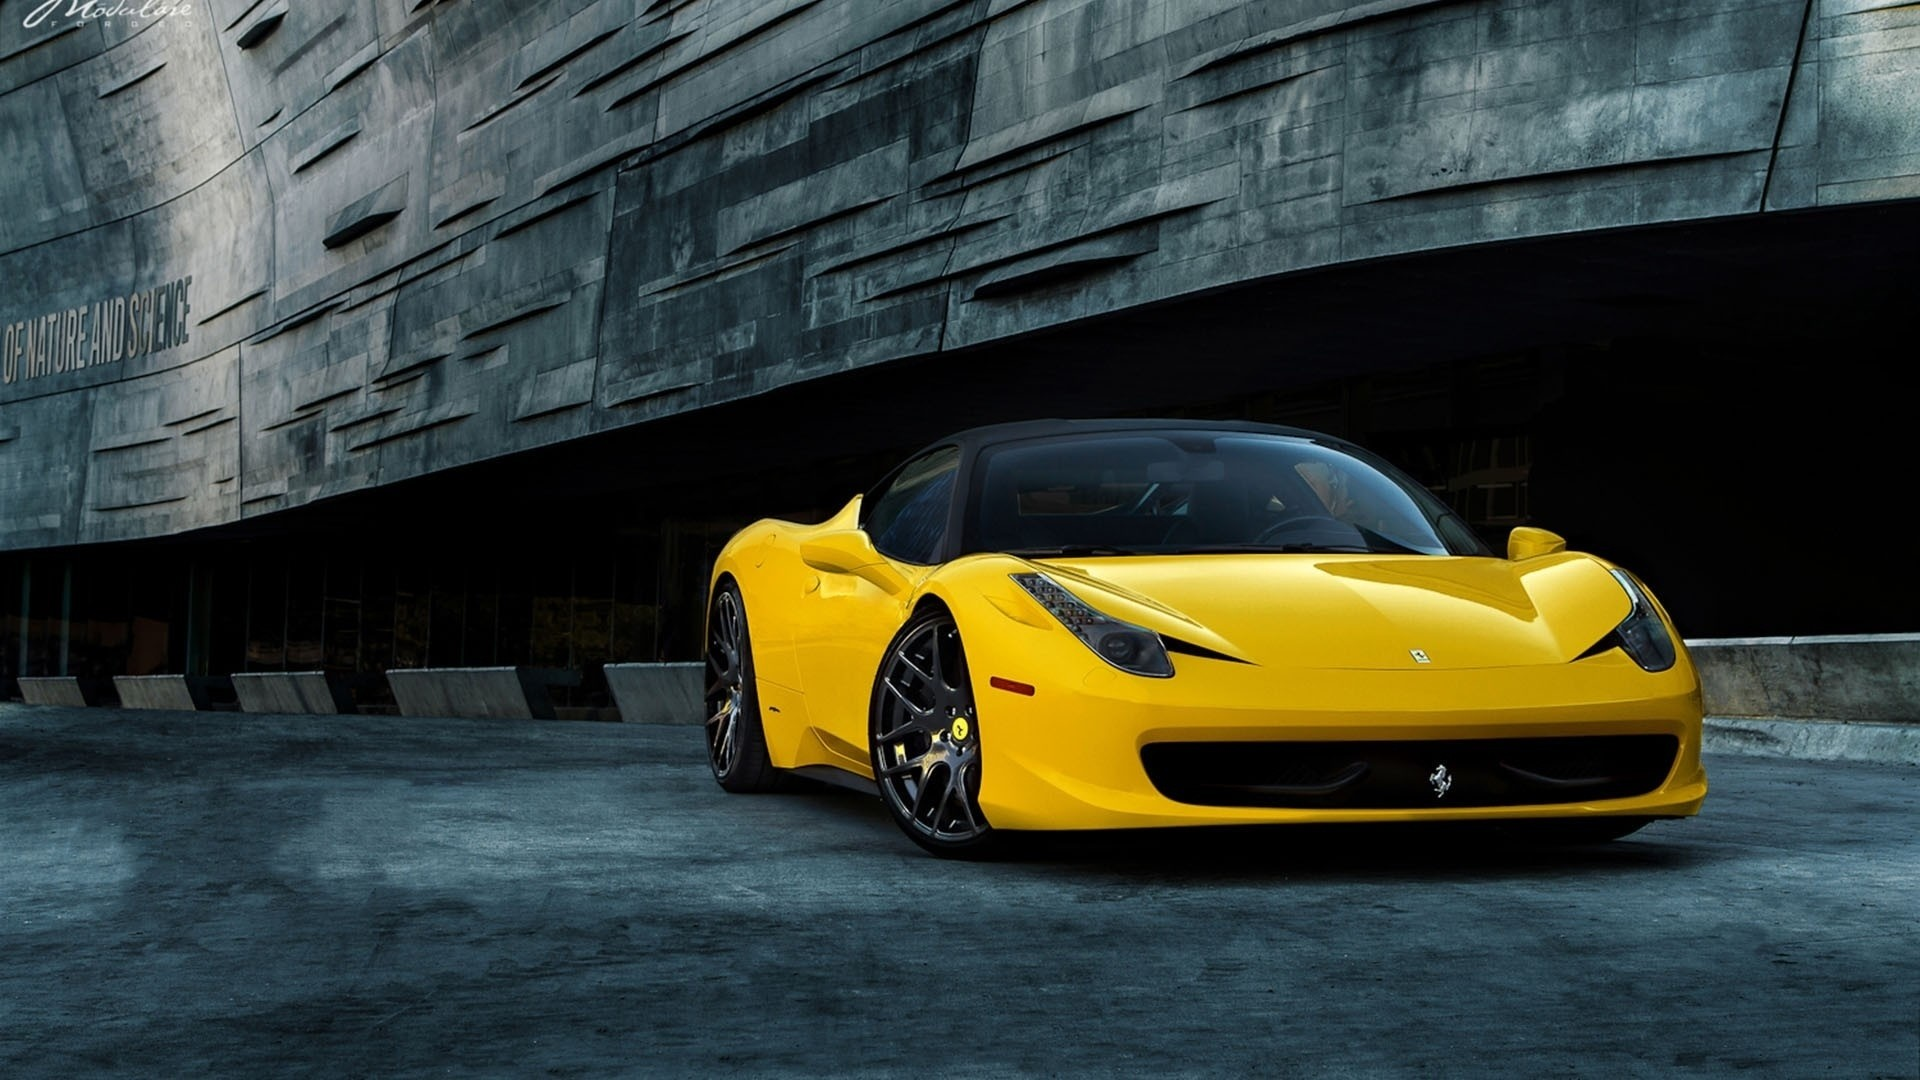 2880x1800 Ferrari Wallpaper Images #NdE | Cars | Pinterest | Ferrari,  Wallpaper And Car Wallpapers